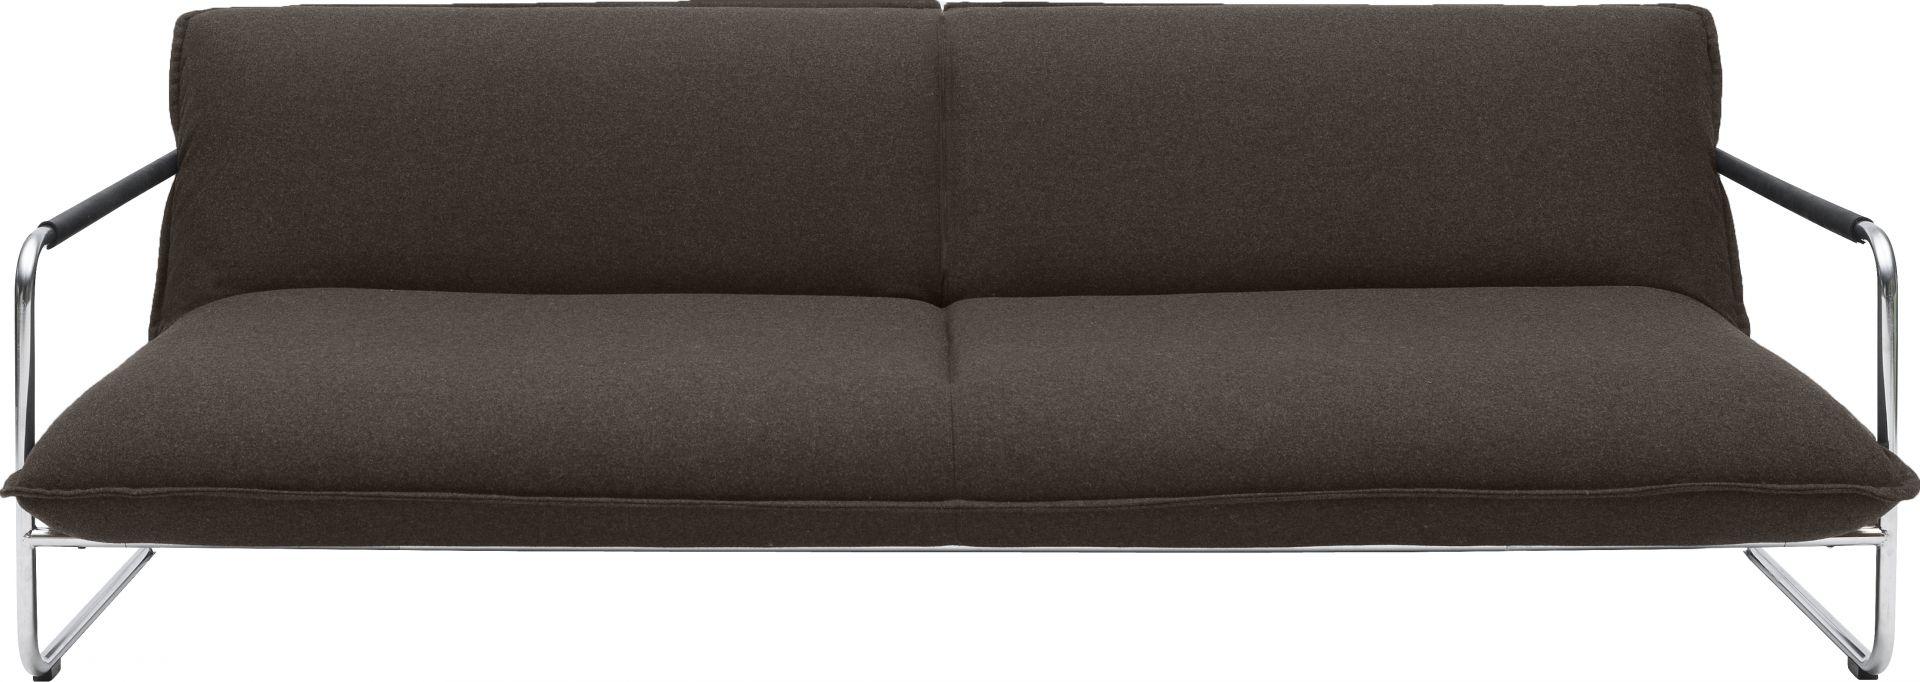 Nova Sofa Bed Softline